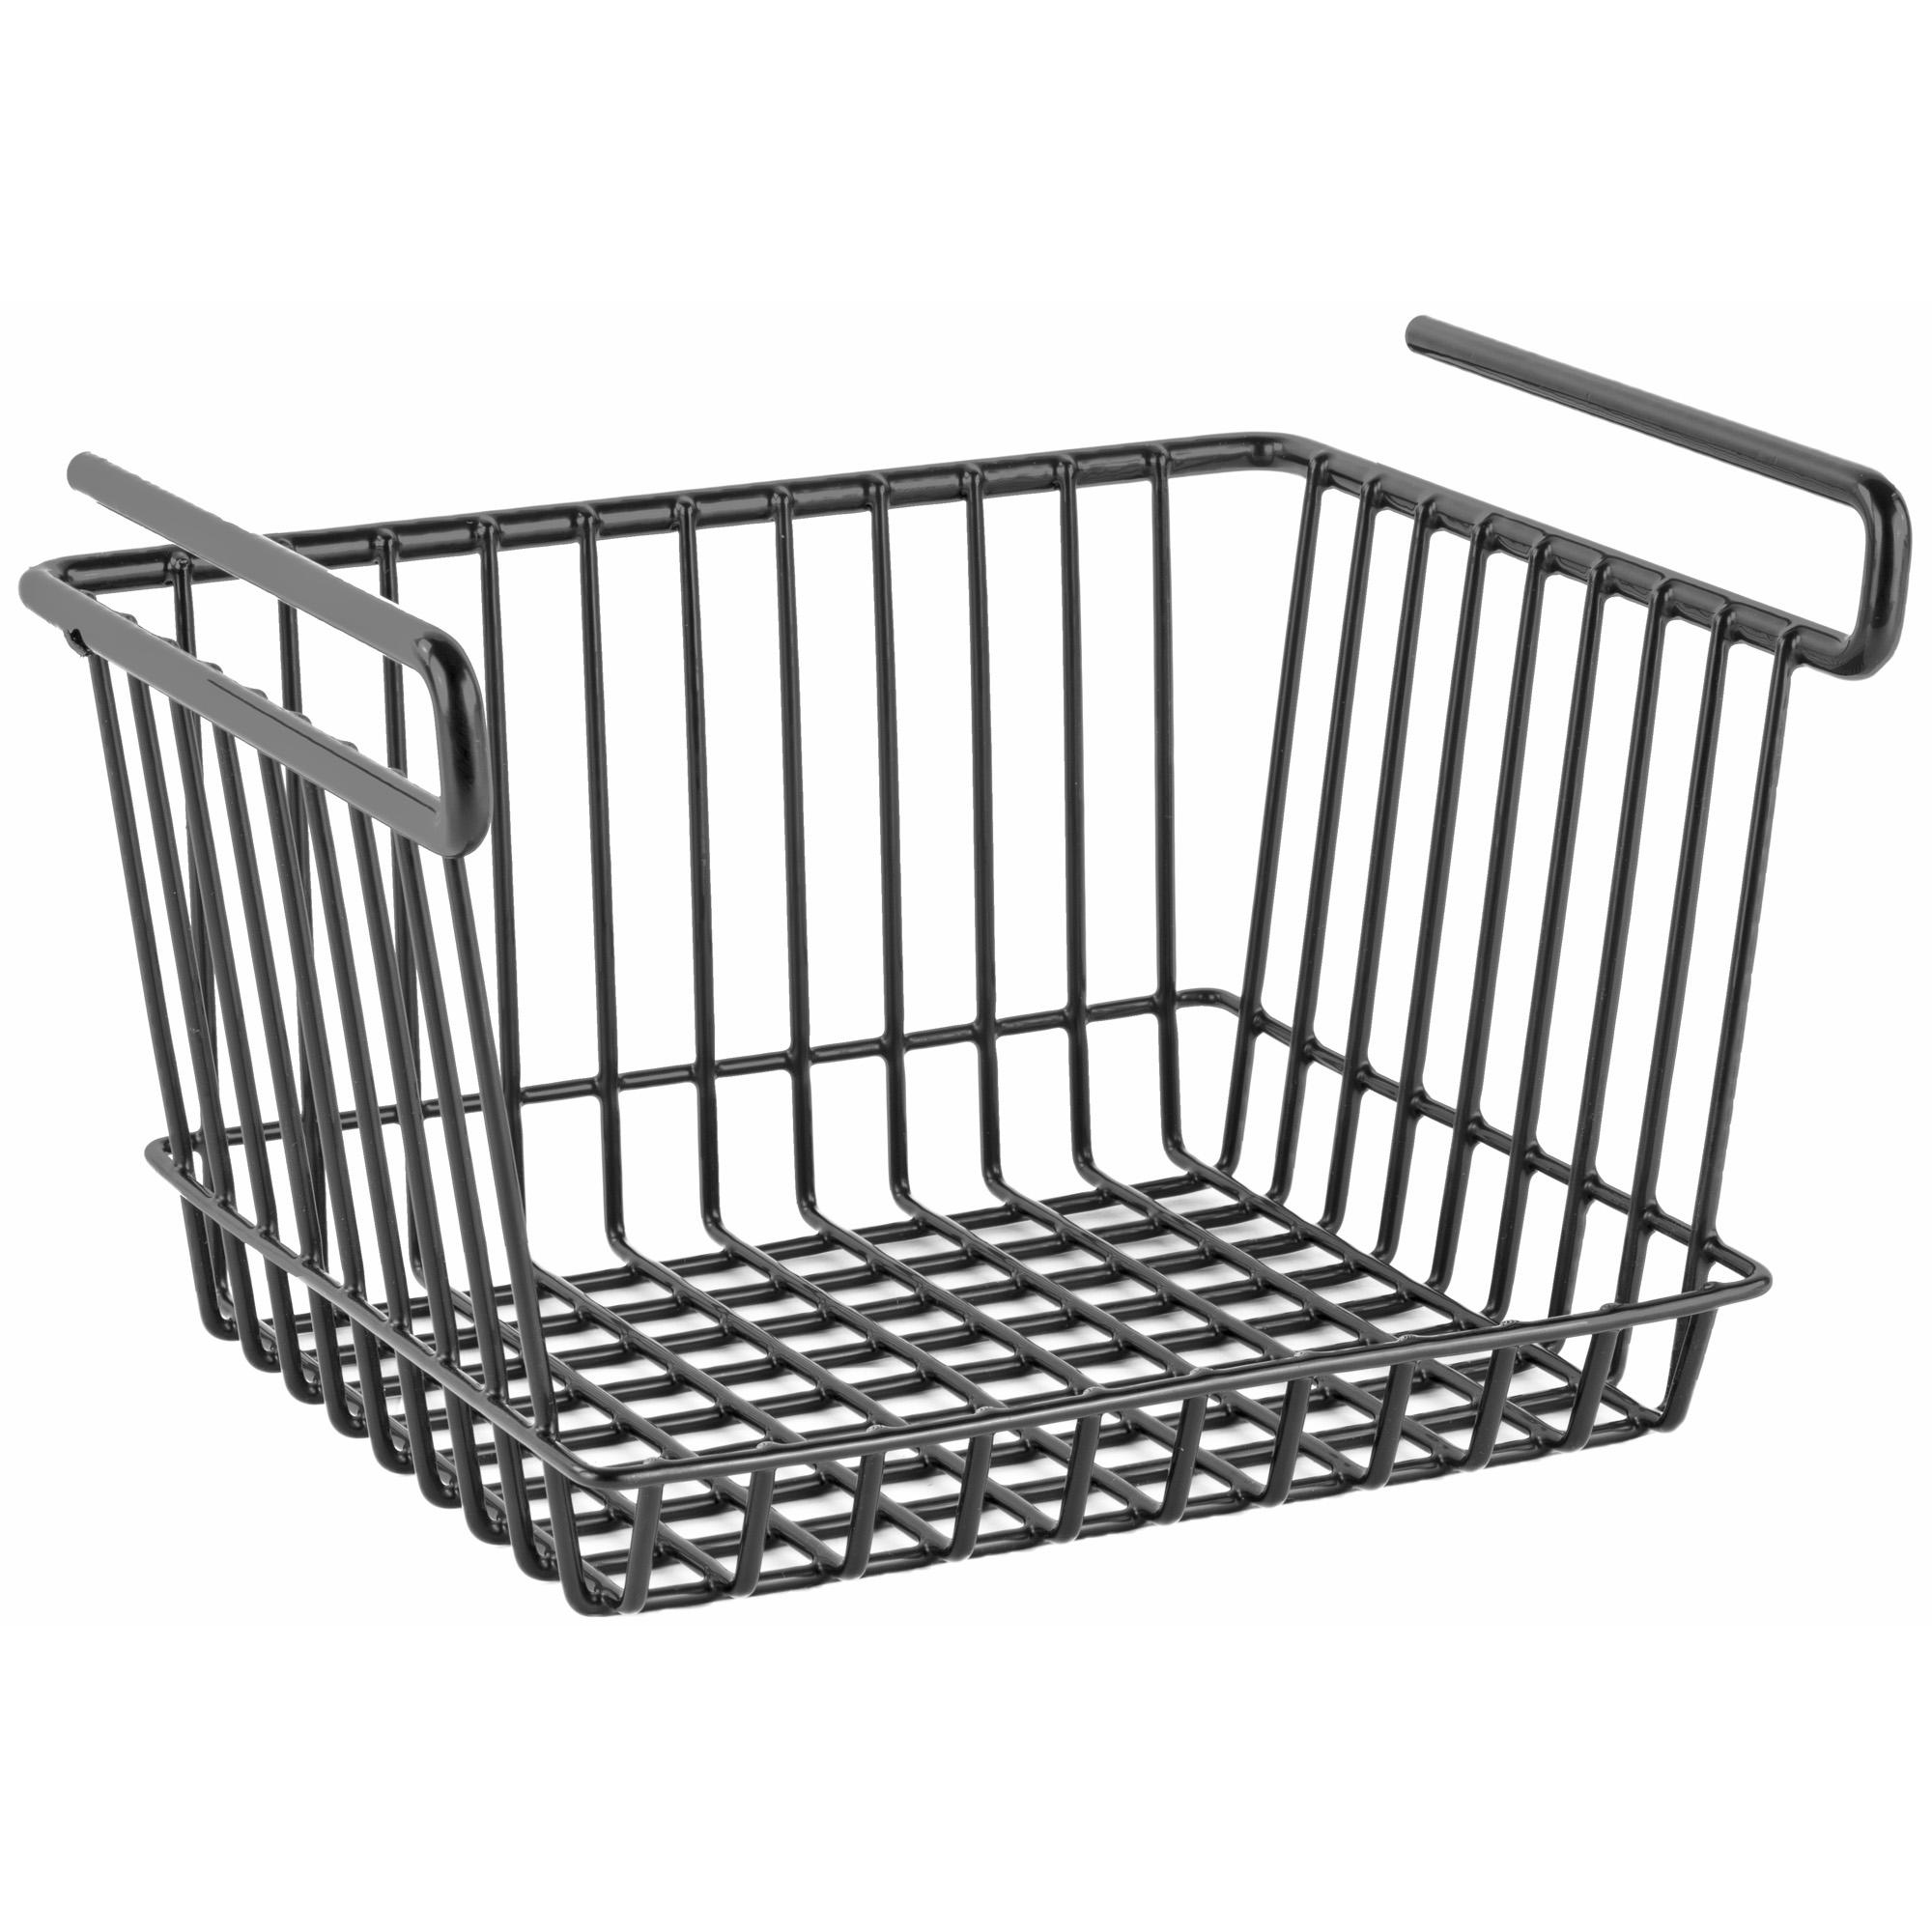 Snapsafe Hanging Shelf Basket Large